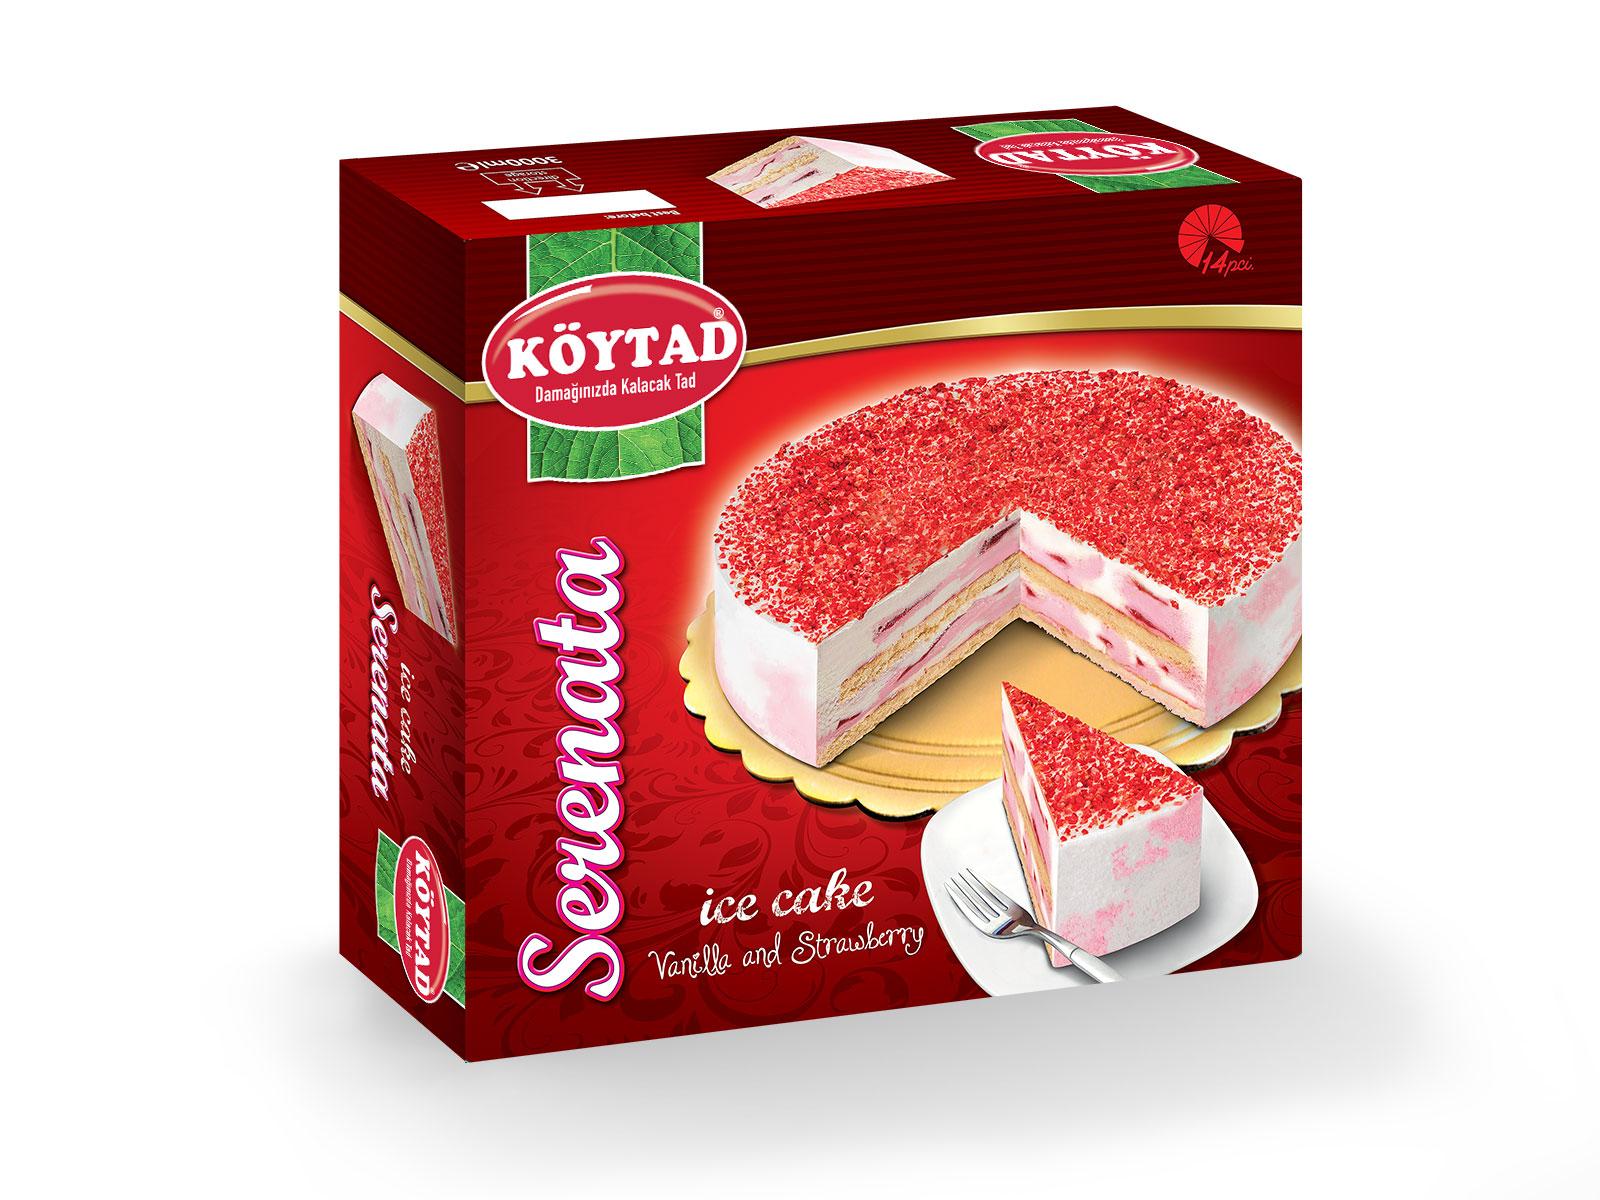 Ice-Cake-Serenata-3D